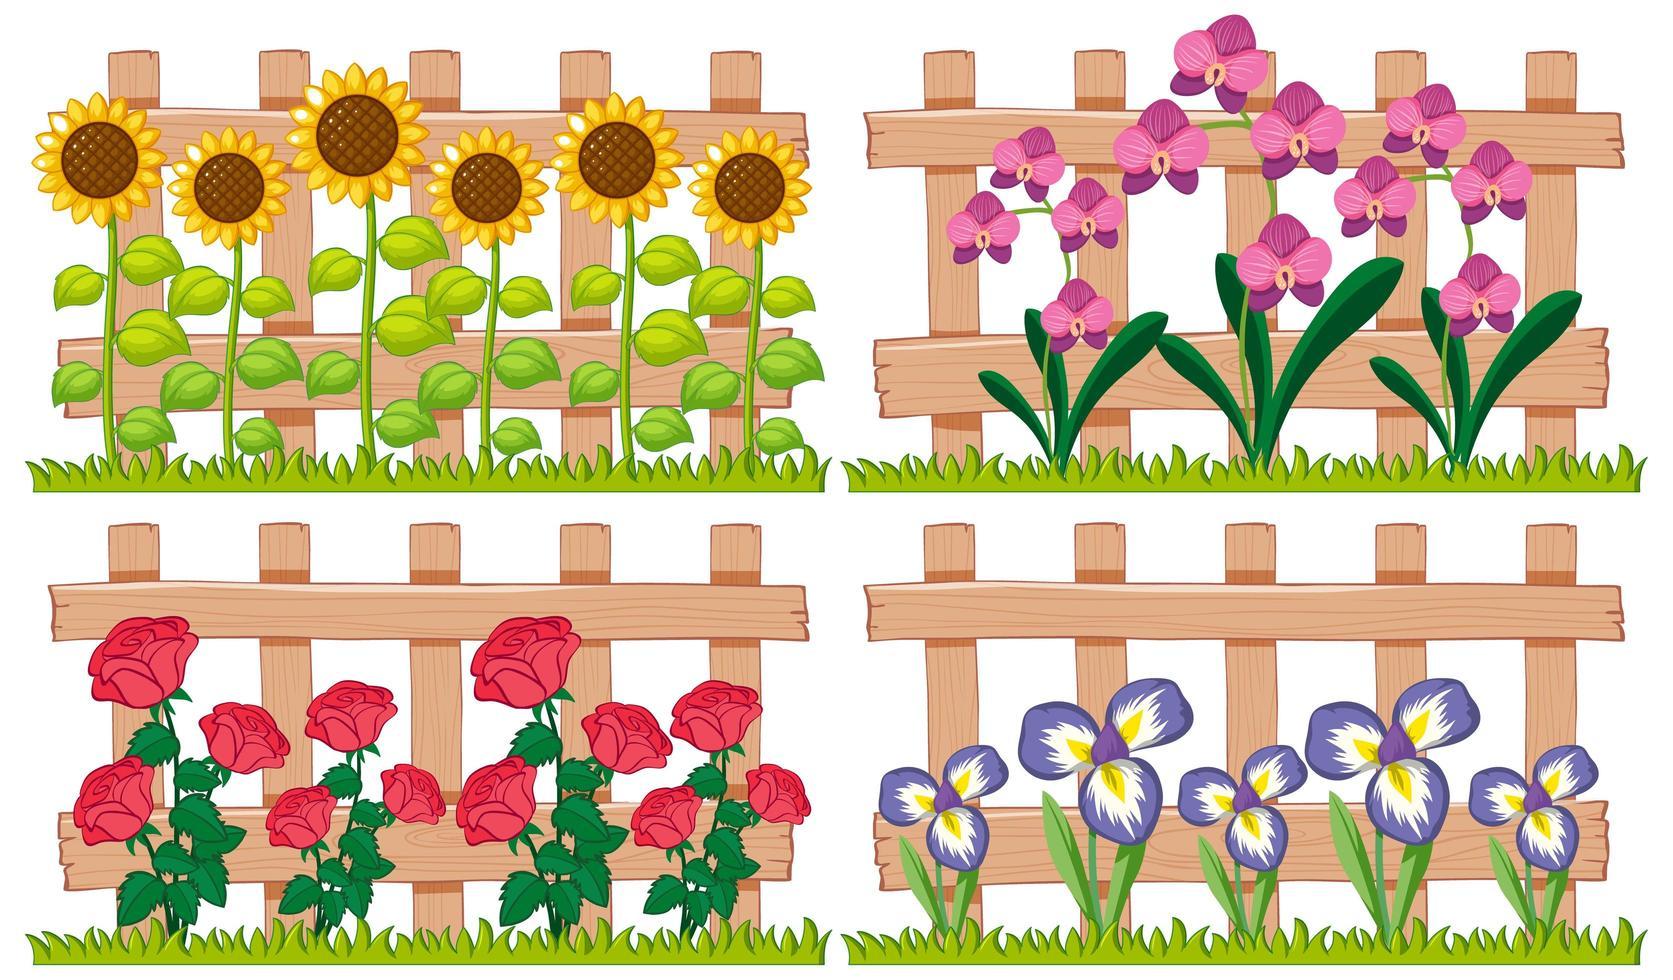 Different Types Of Flowers In The Garden Download Free Vectors Clipart Graphics Vector Art